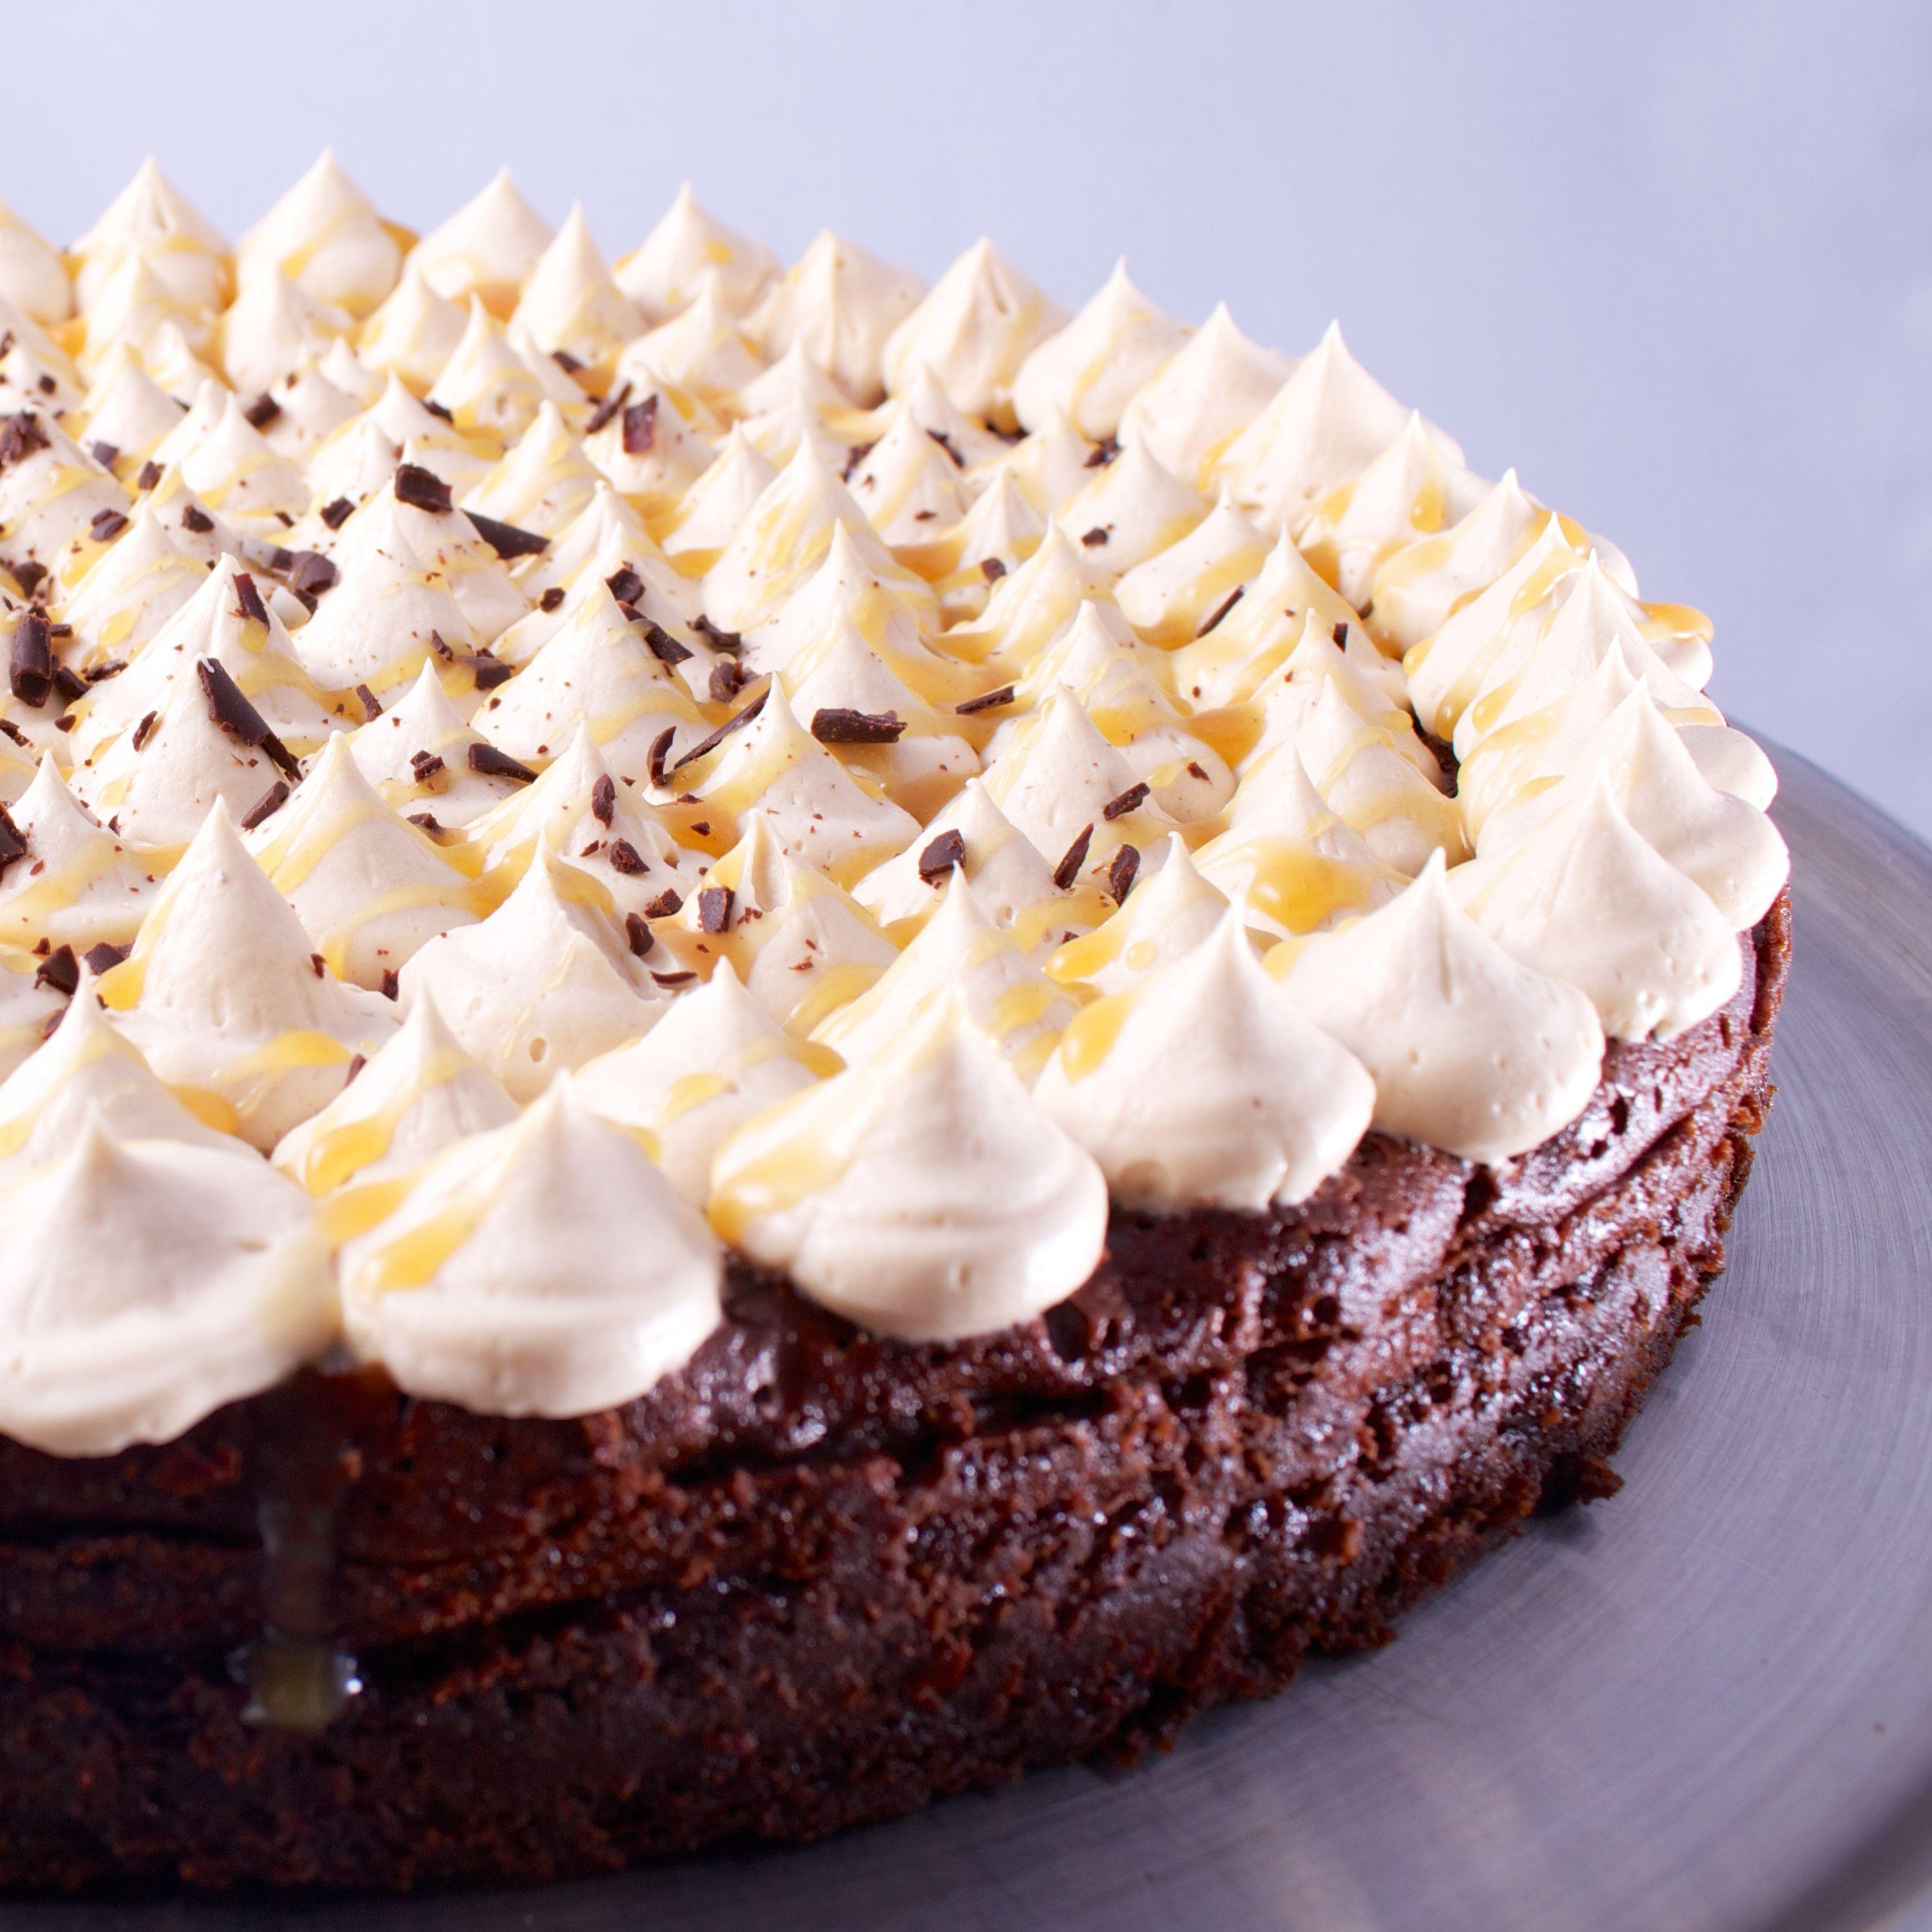 Cobb galleria centre hazelnut torte torte recipe food